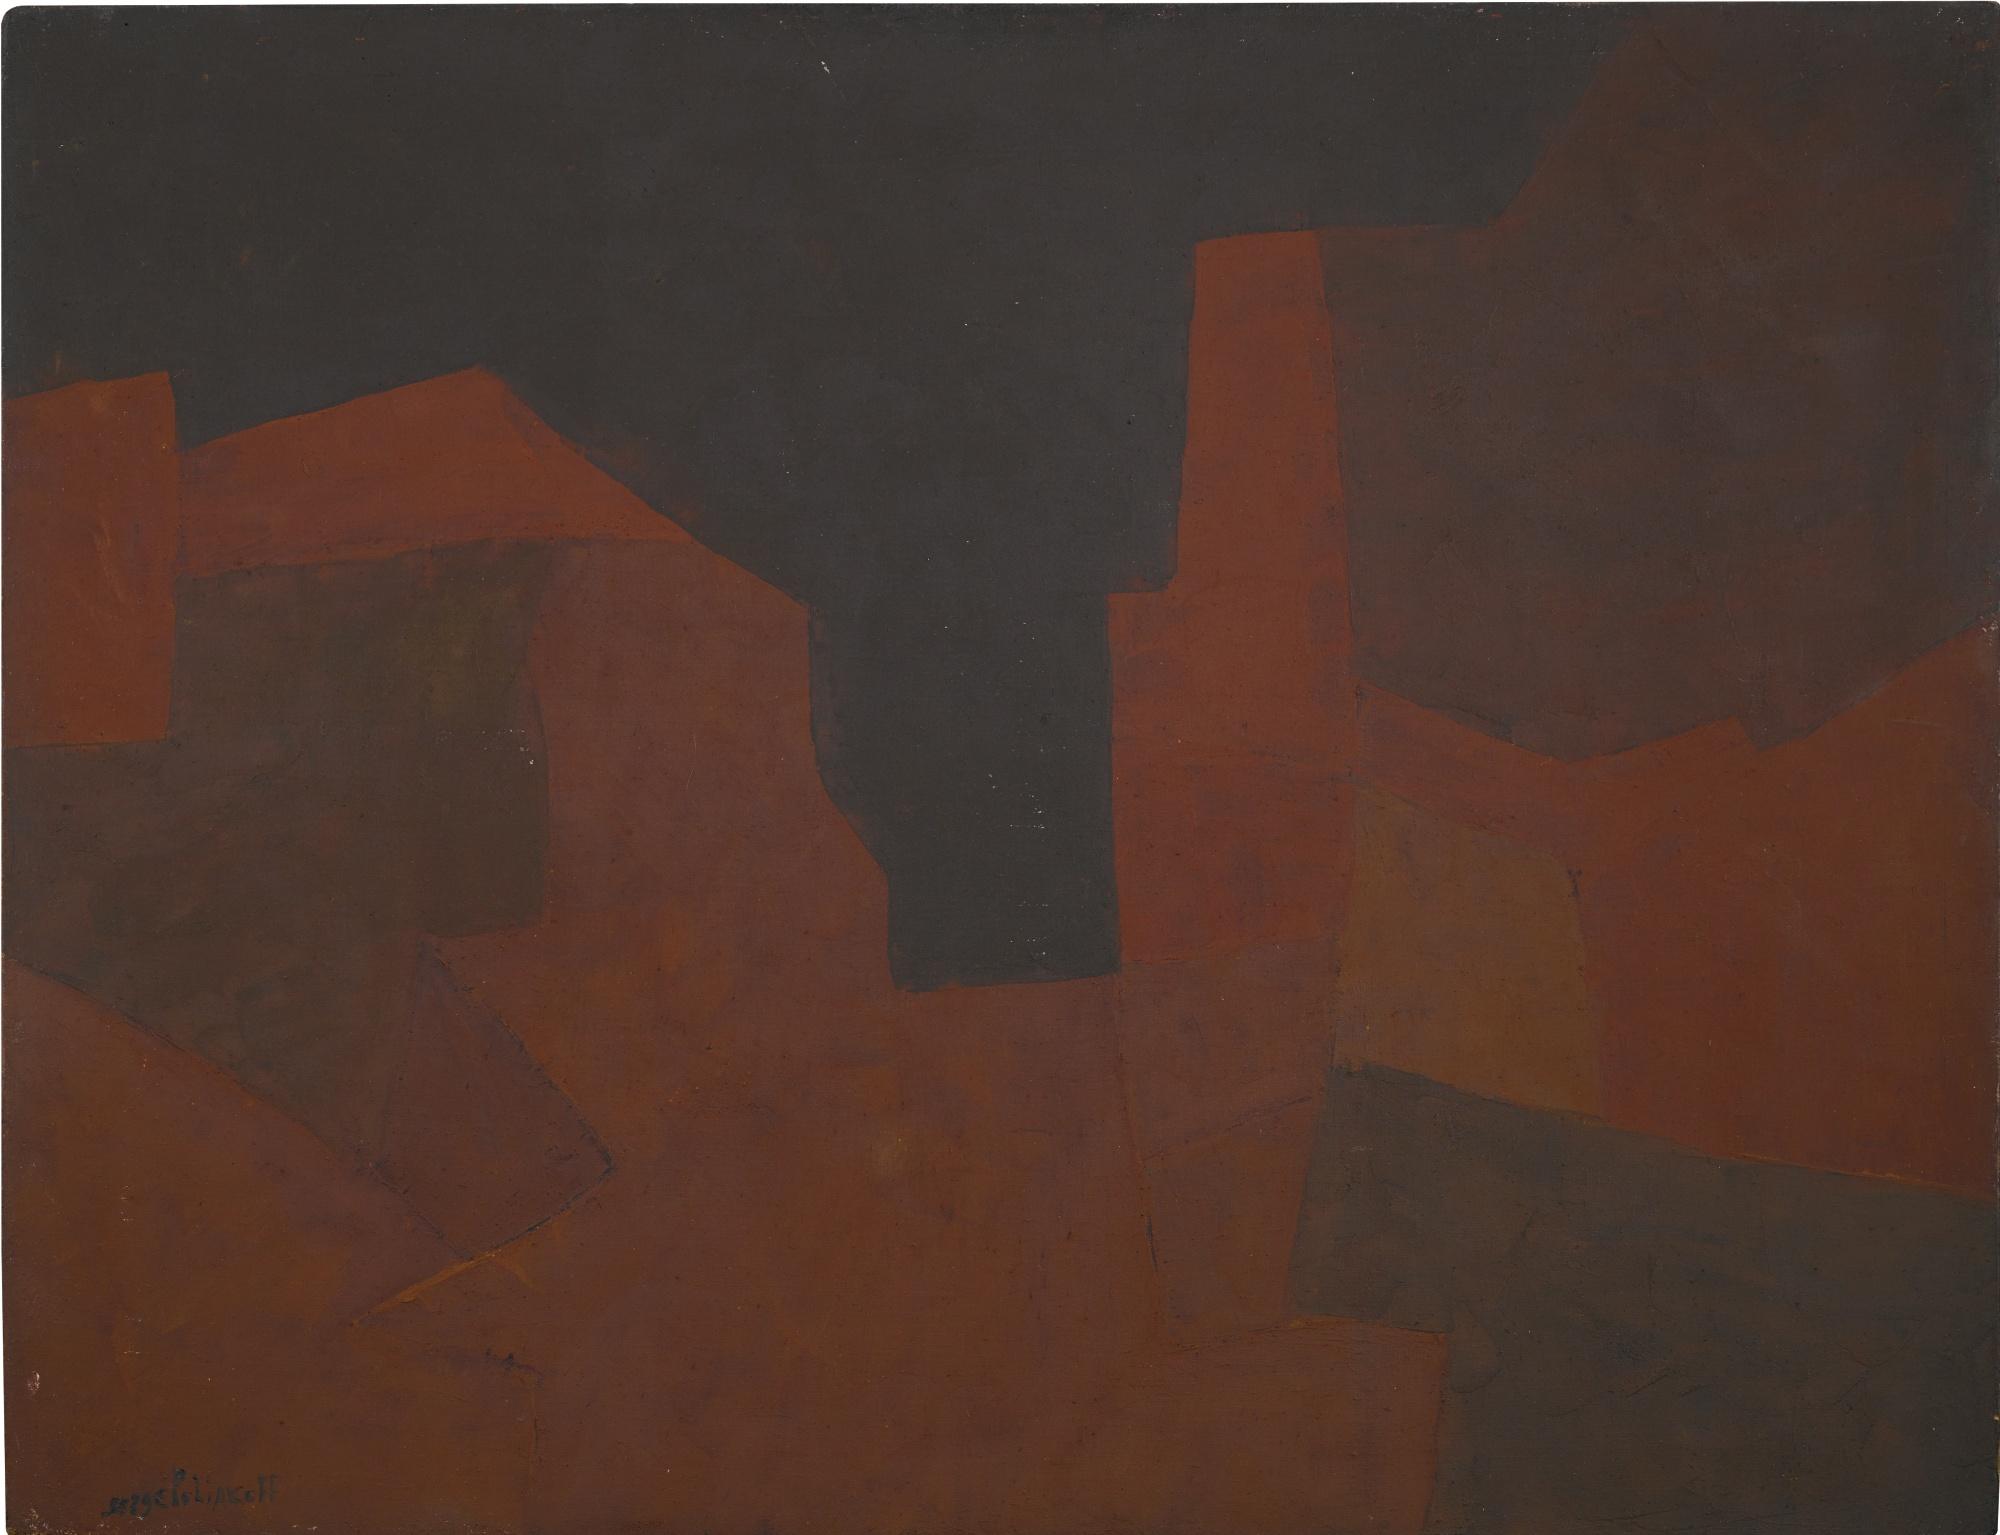 Serge Poliakoff-Marron-1955